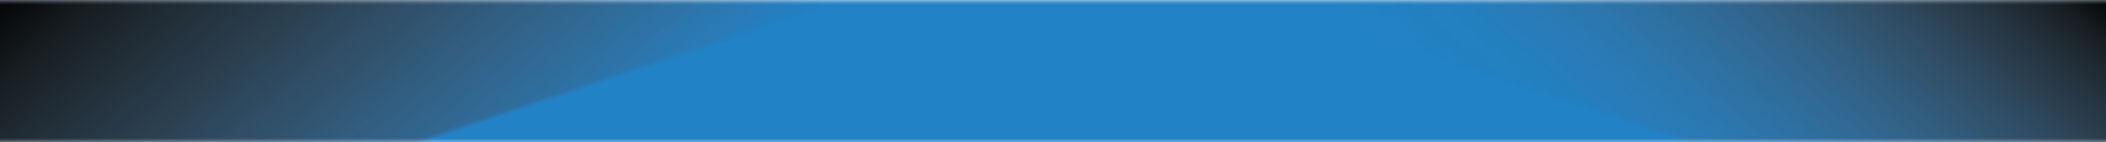 Proposal Profile-bar-01.jpg